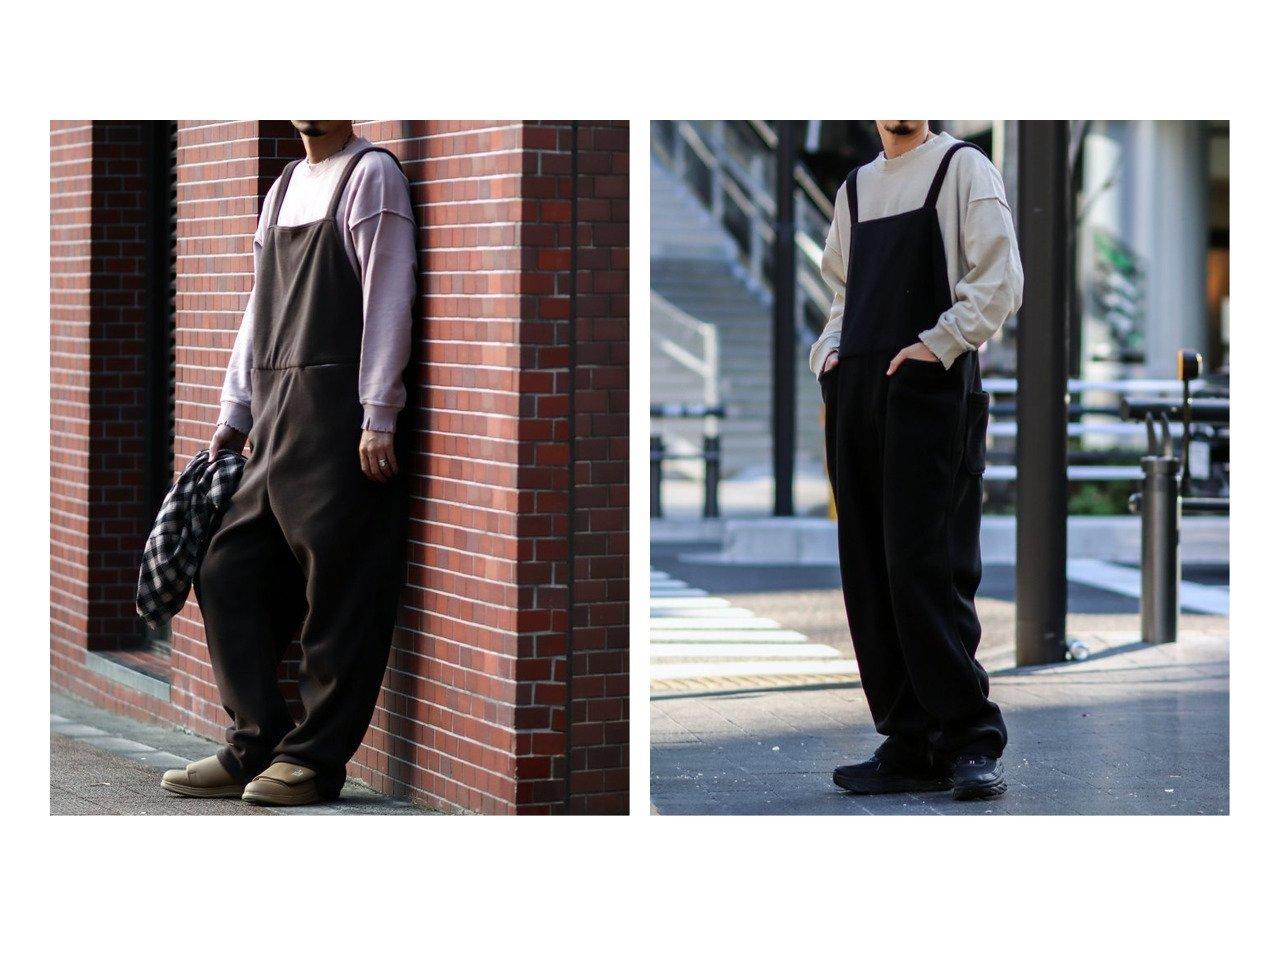 【JOURNAL STANDARD relume / MEN/ジャーナルスタンダード レリューム】の【relume × スミス】別注フリース オーバーオール 【MEN】別注・限定・コラボなど、おすすめで人気!メンズファッション通販 おすすめで人気のファッション通販商品 インテリア・家具・キッズファッション・メンズファッション・レディースファッション・服の通販 founy(ファニー) https://founy.com/ ファッション Fashion メンズ MEN サスペンダー ニューヨーク ベーシック ポケット 別注 リラックス ワーク |ID:crp329100000004602